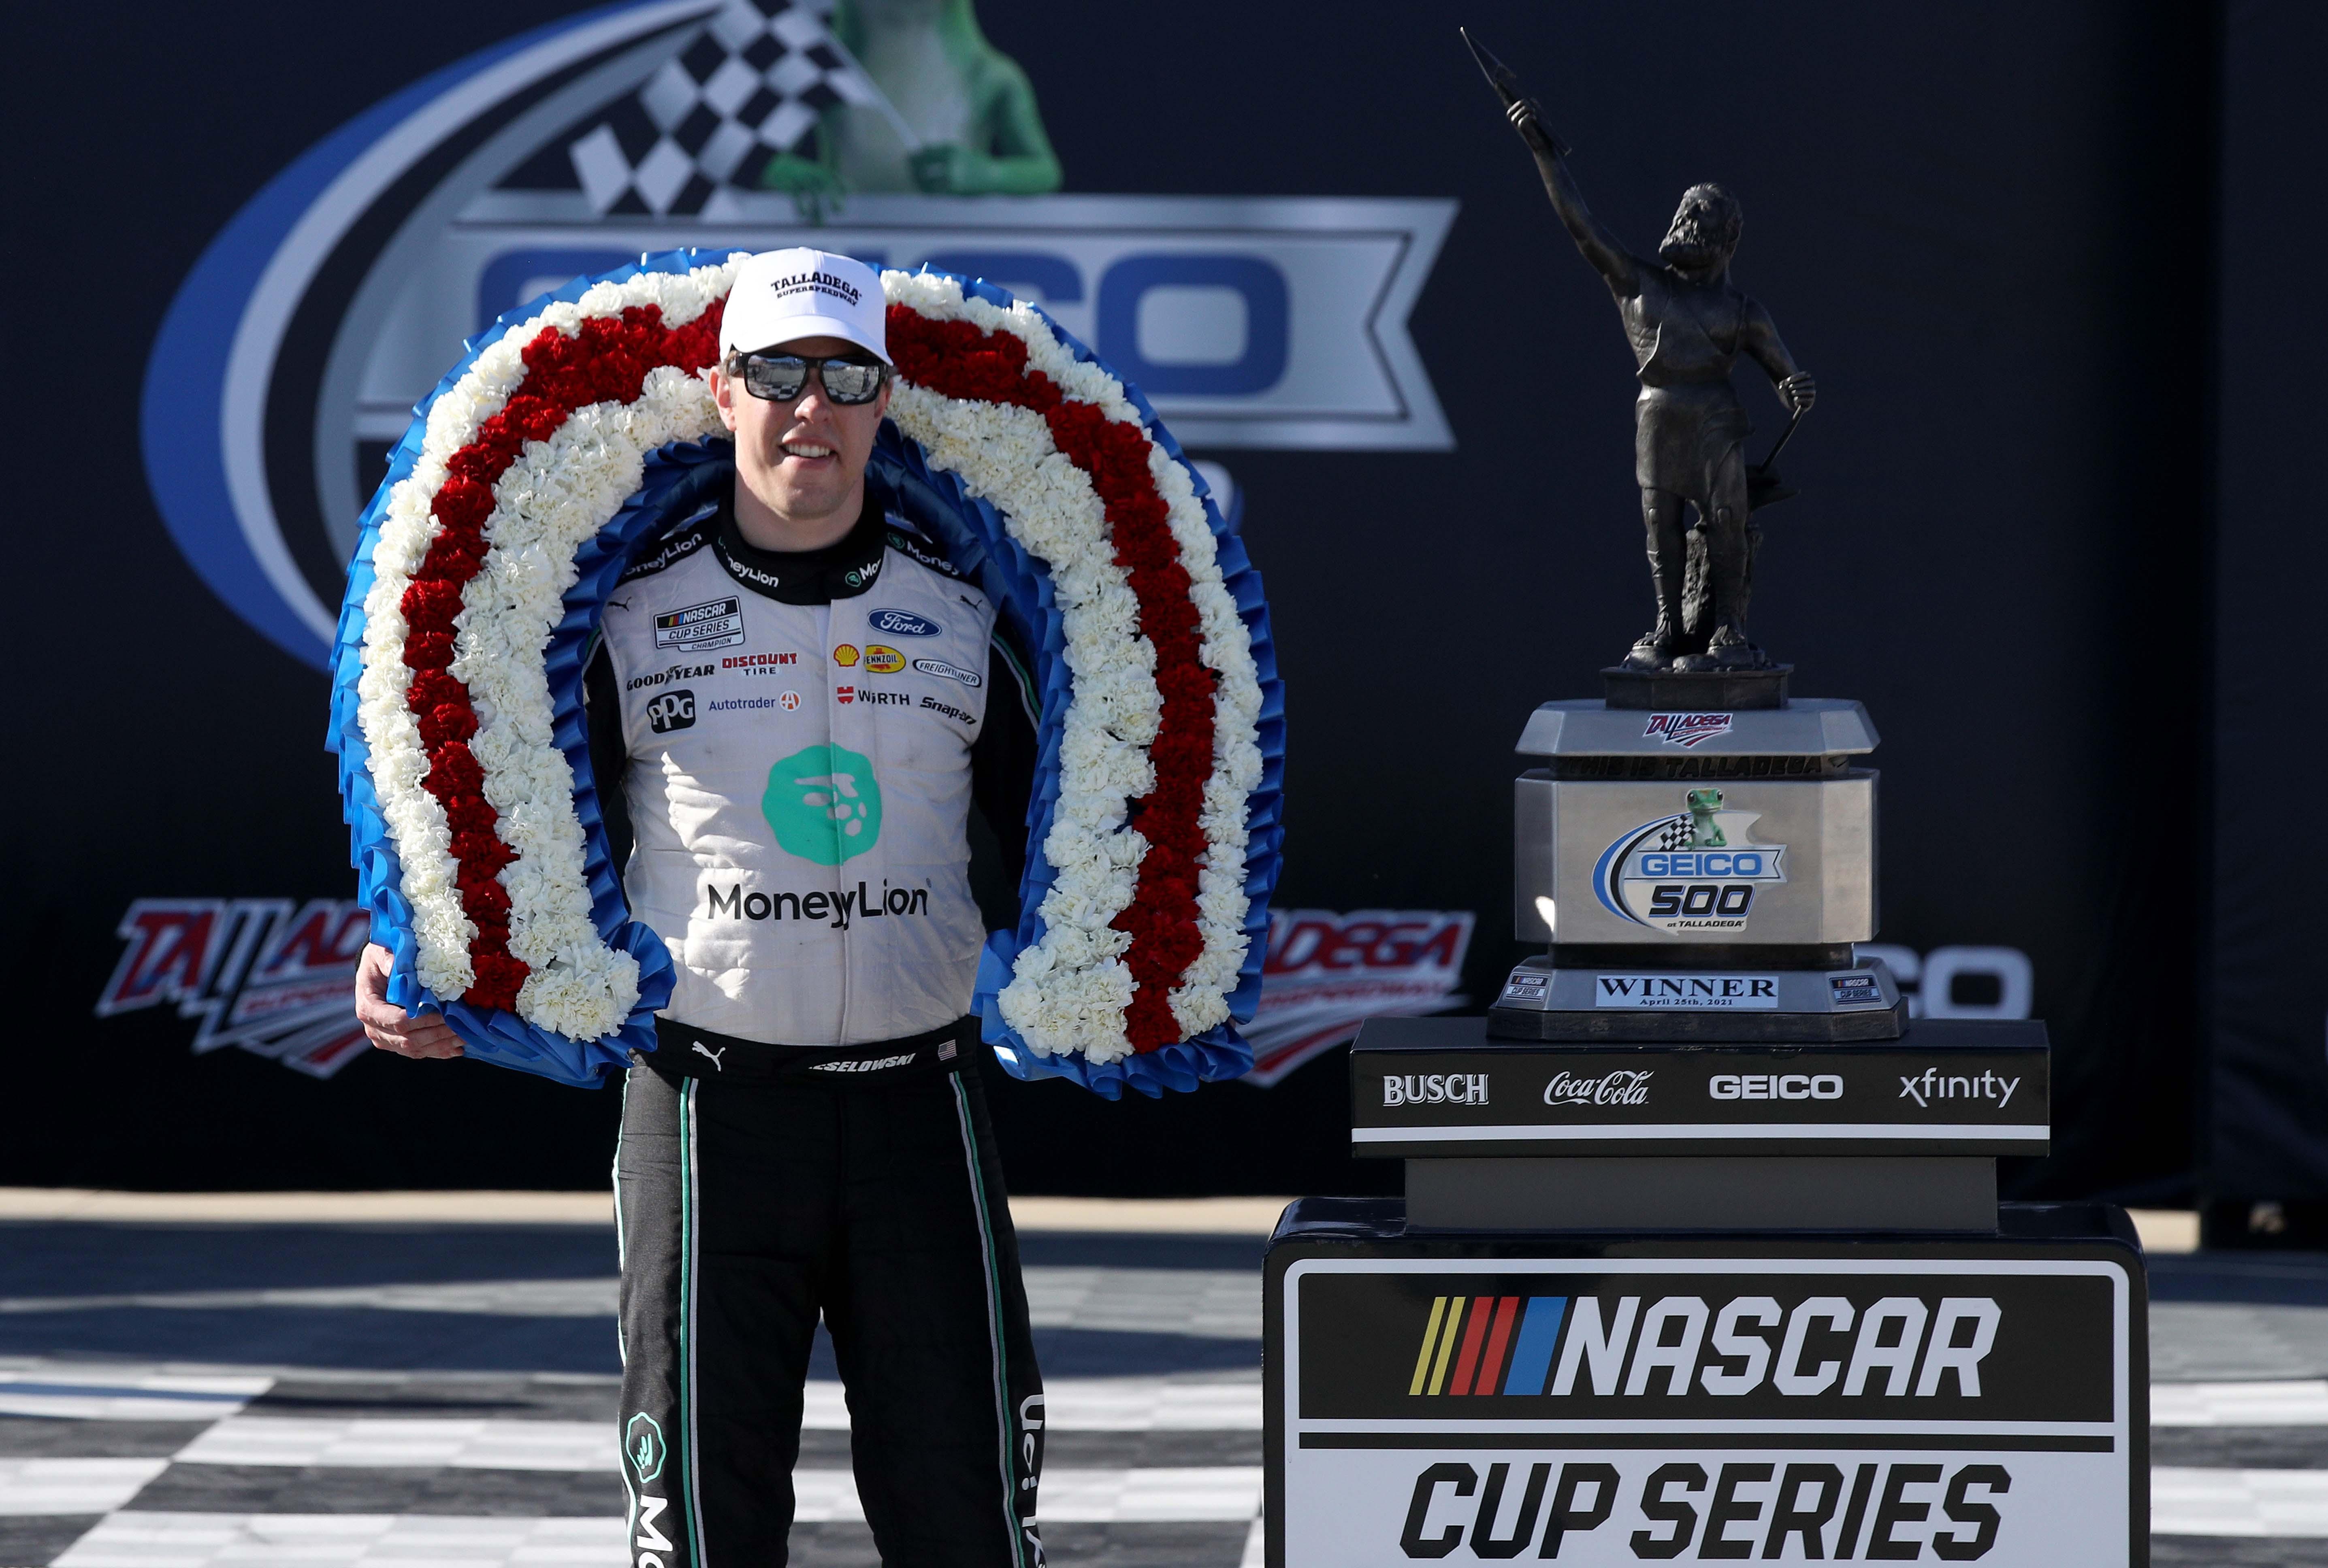 Brad Keselowski wins at Talladega Superspeedway - NASCAR Cup Series